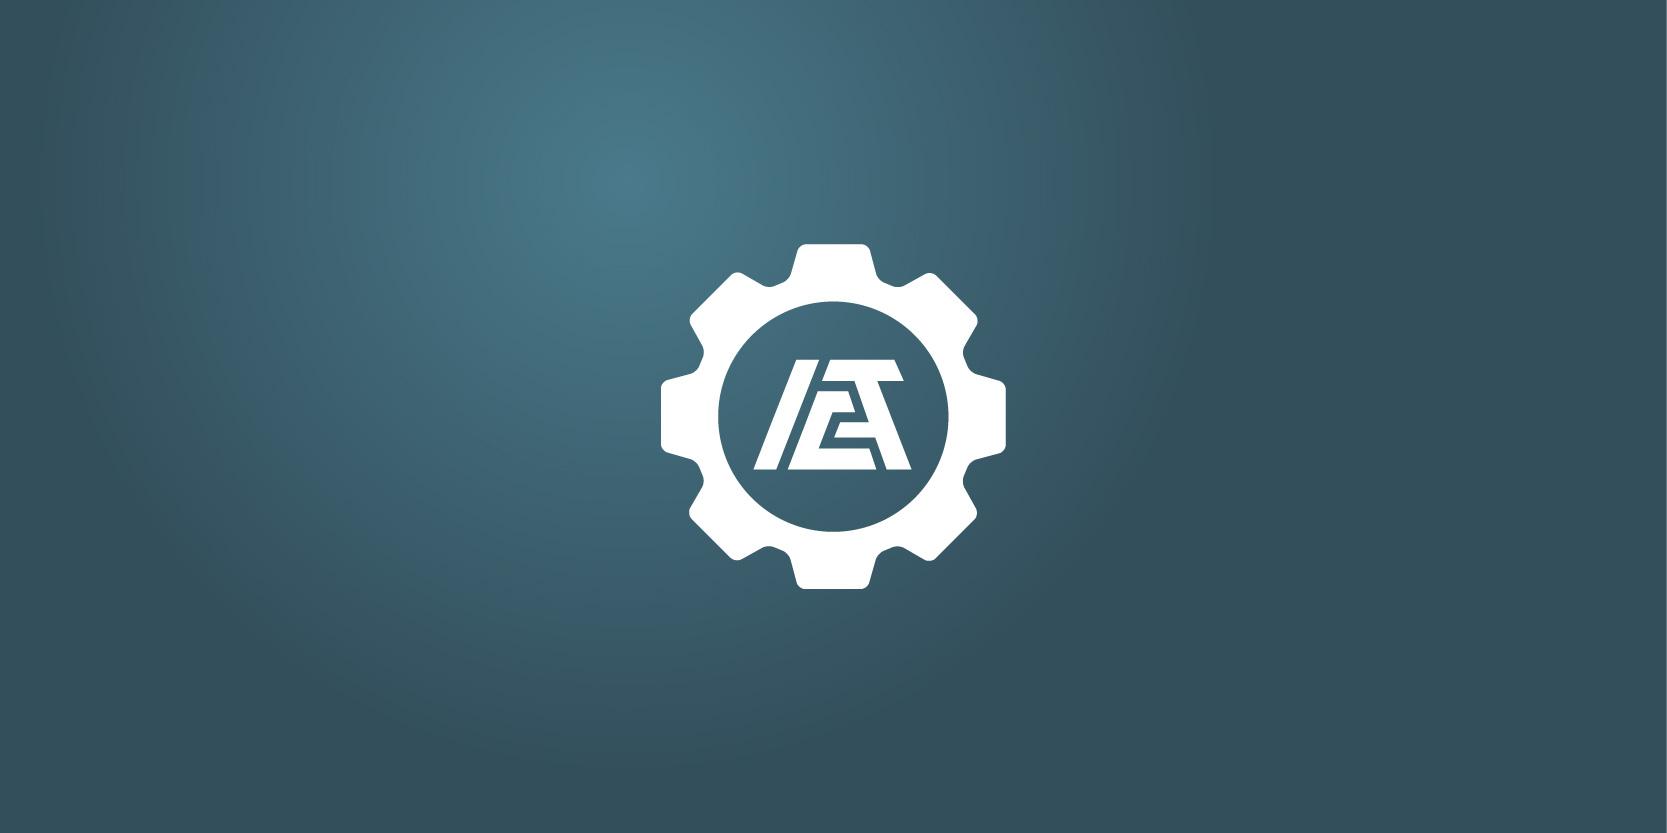 Логотип для Ассоциации спецтехники фото f_5665145f1f7038a6.jpg